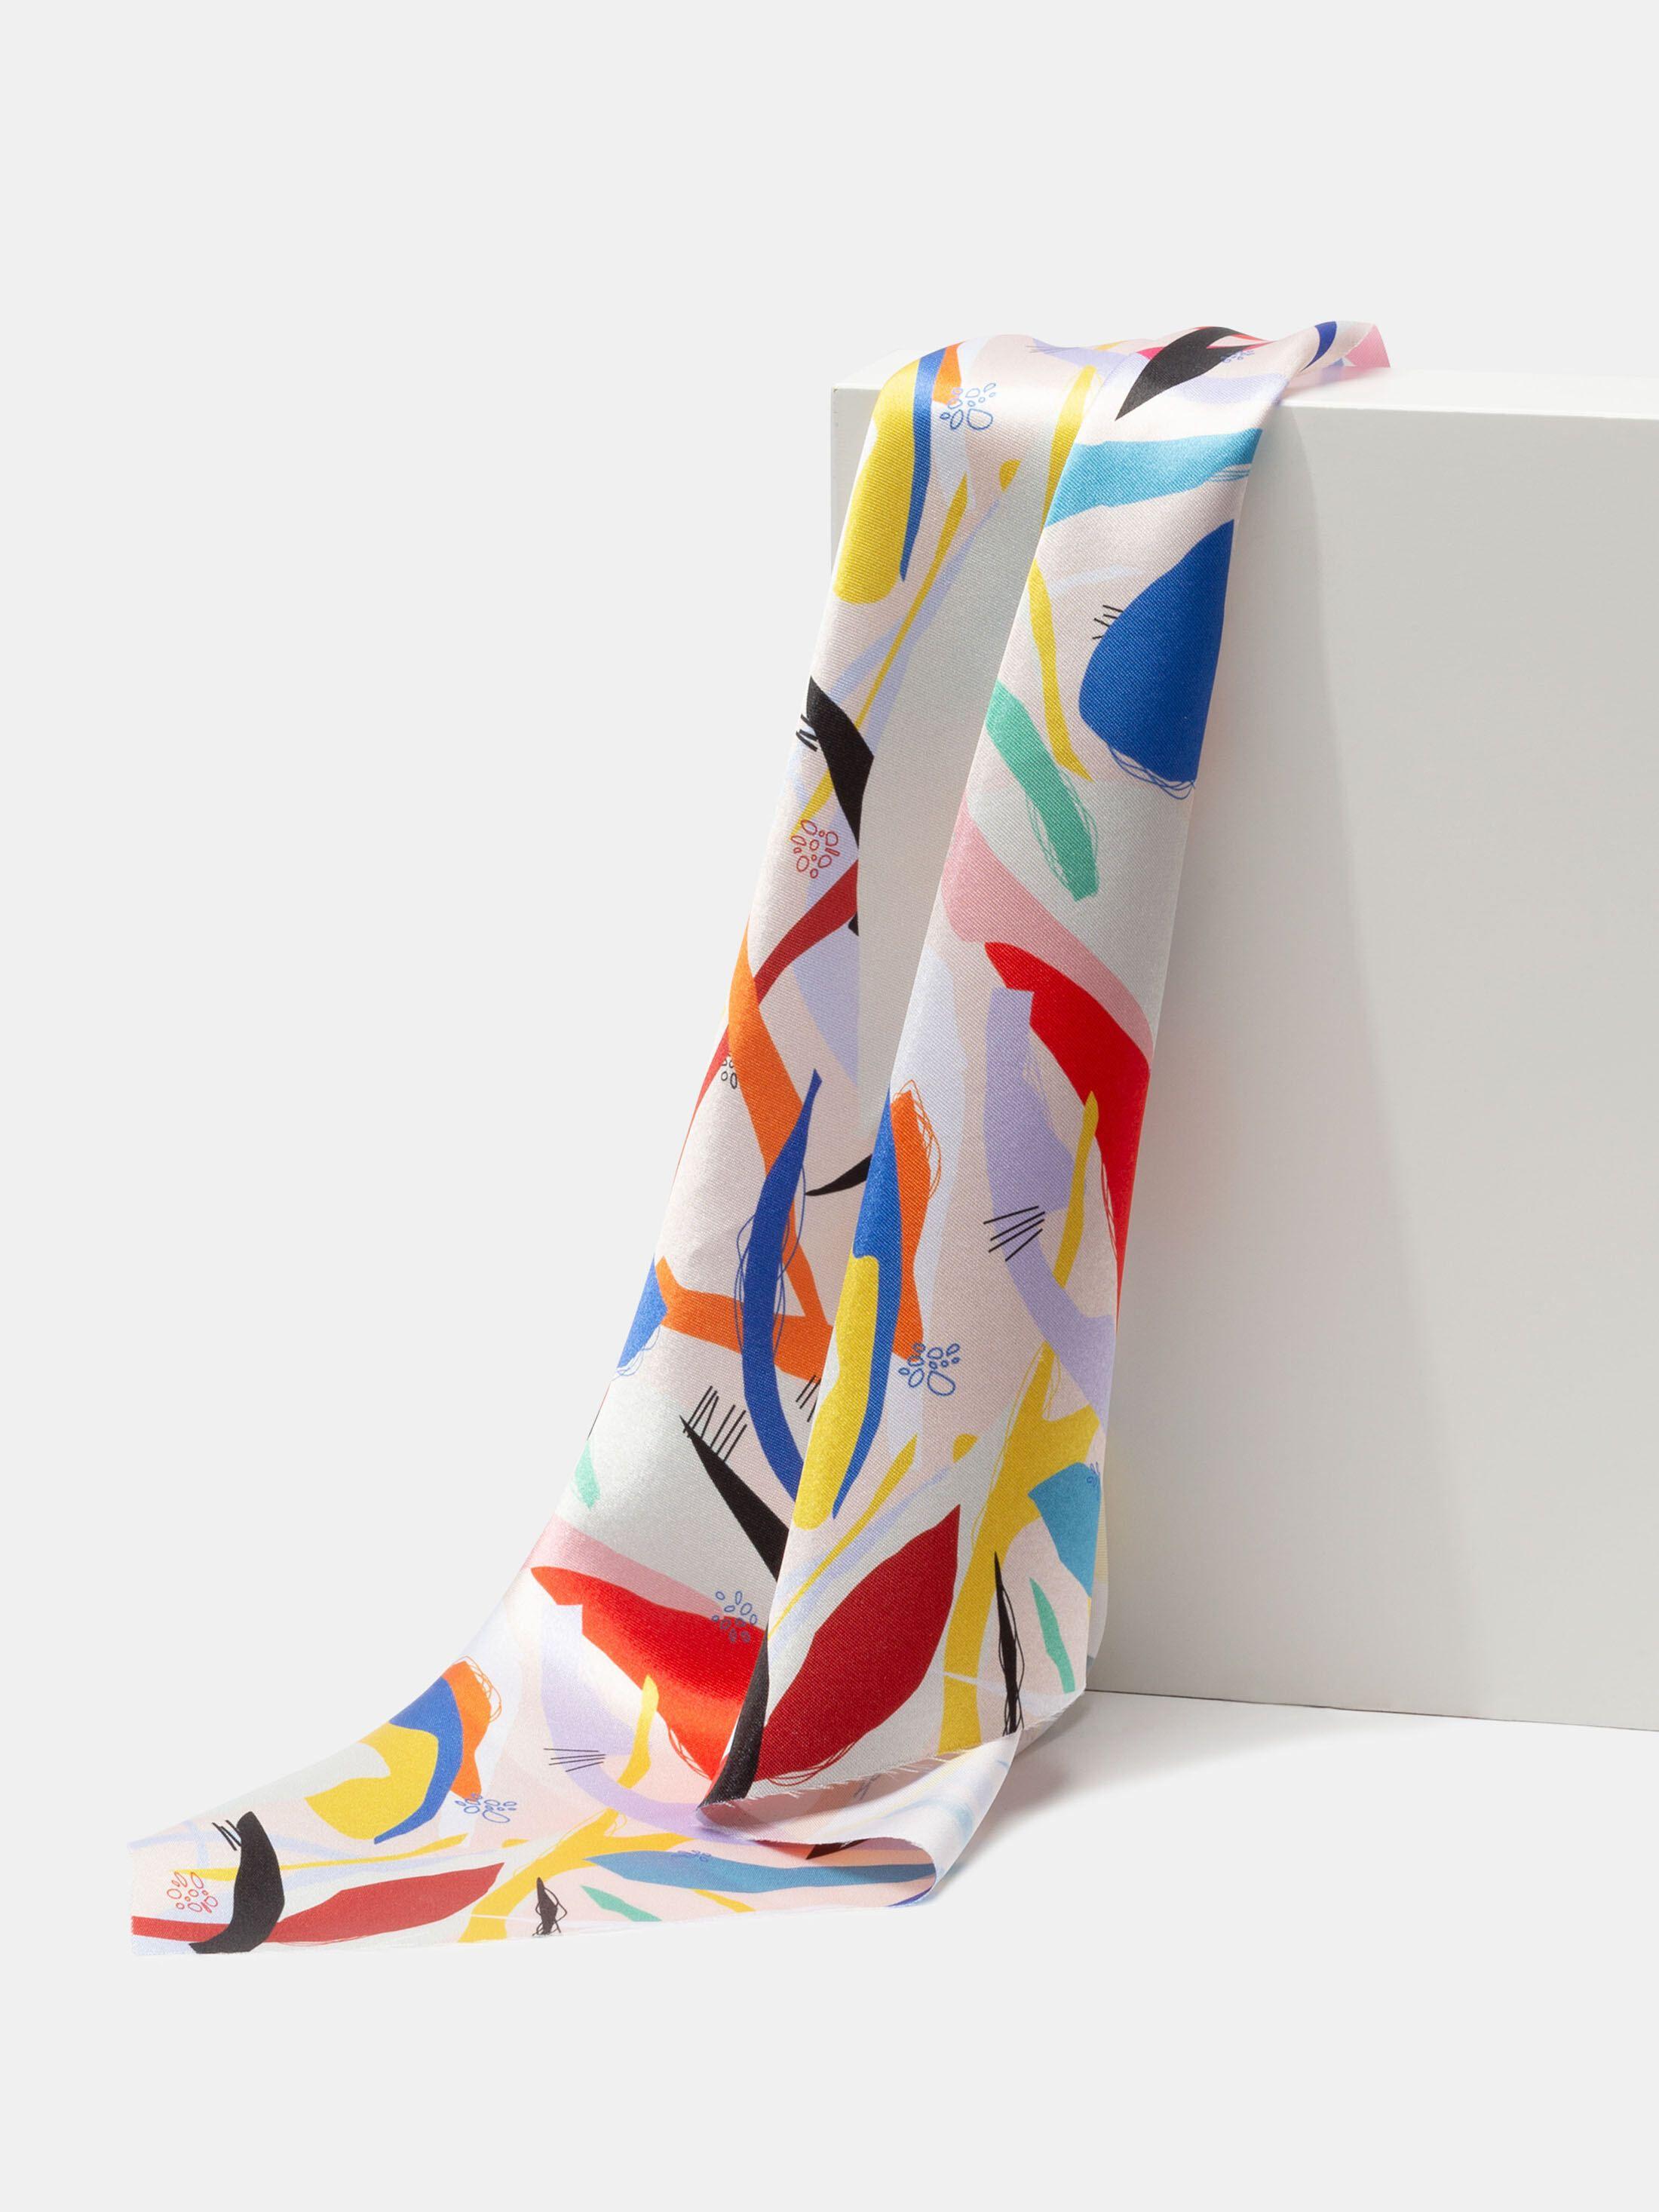 print Lucent Satin fabric folds